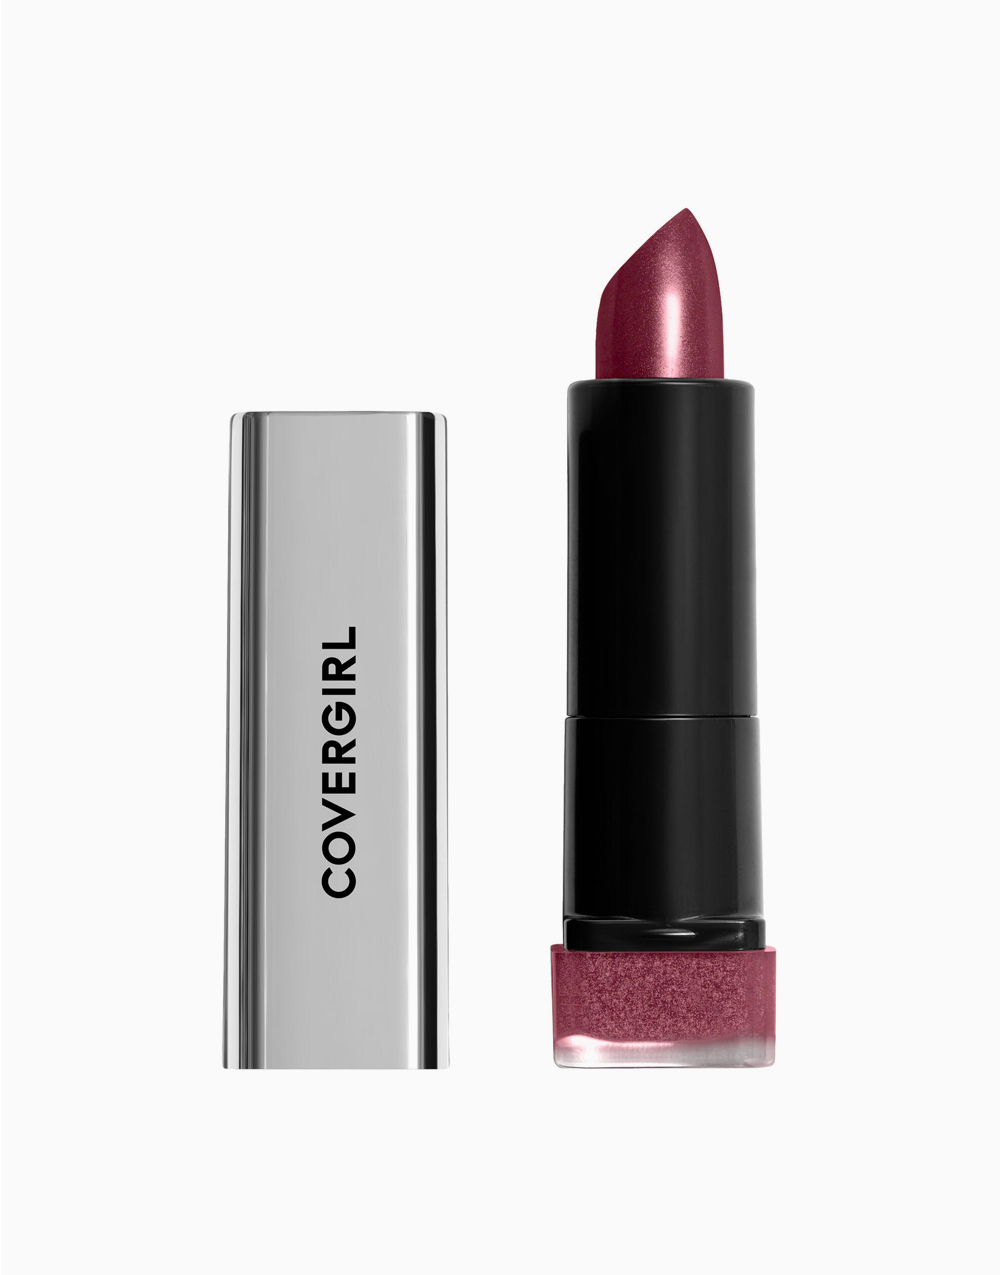 Exhibitionist Metallic Lipstick by CoverGirl | Rendezvous